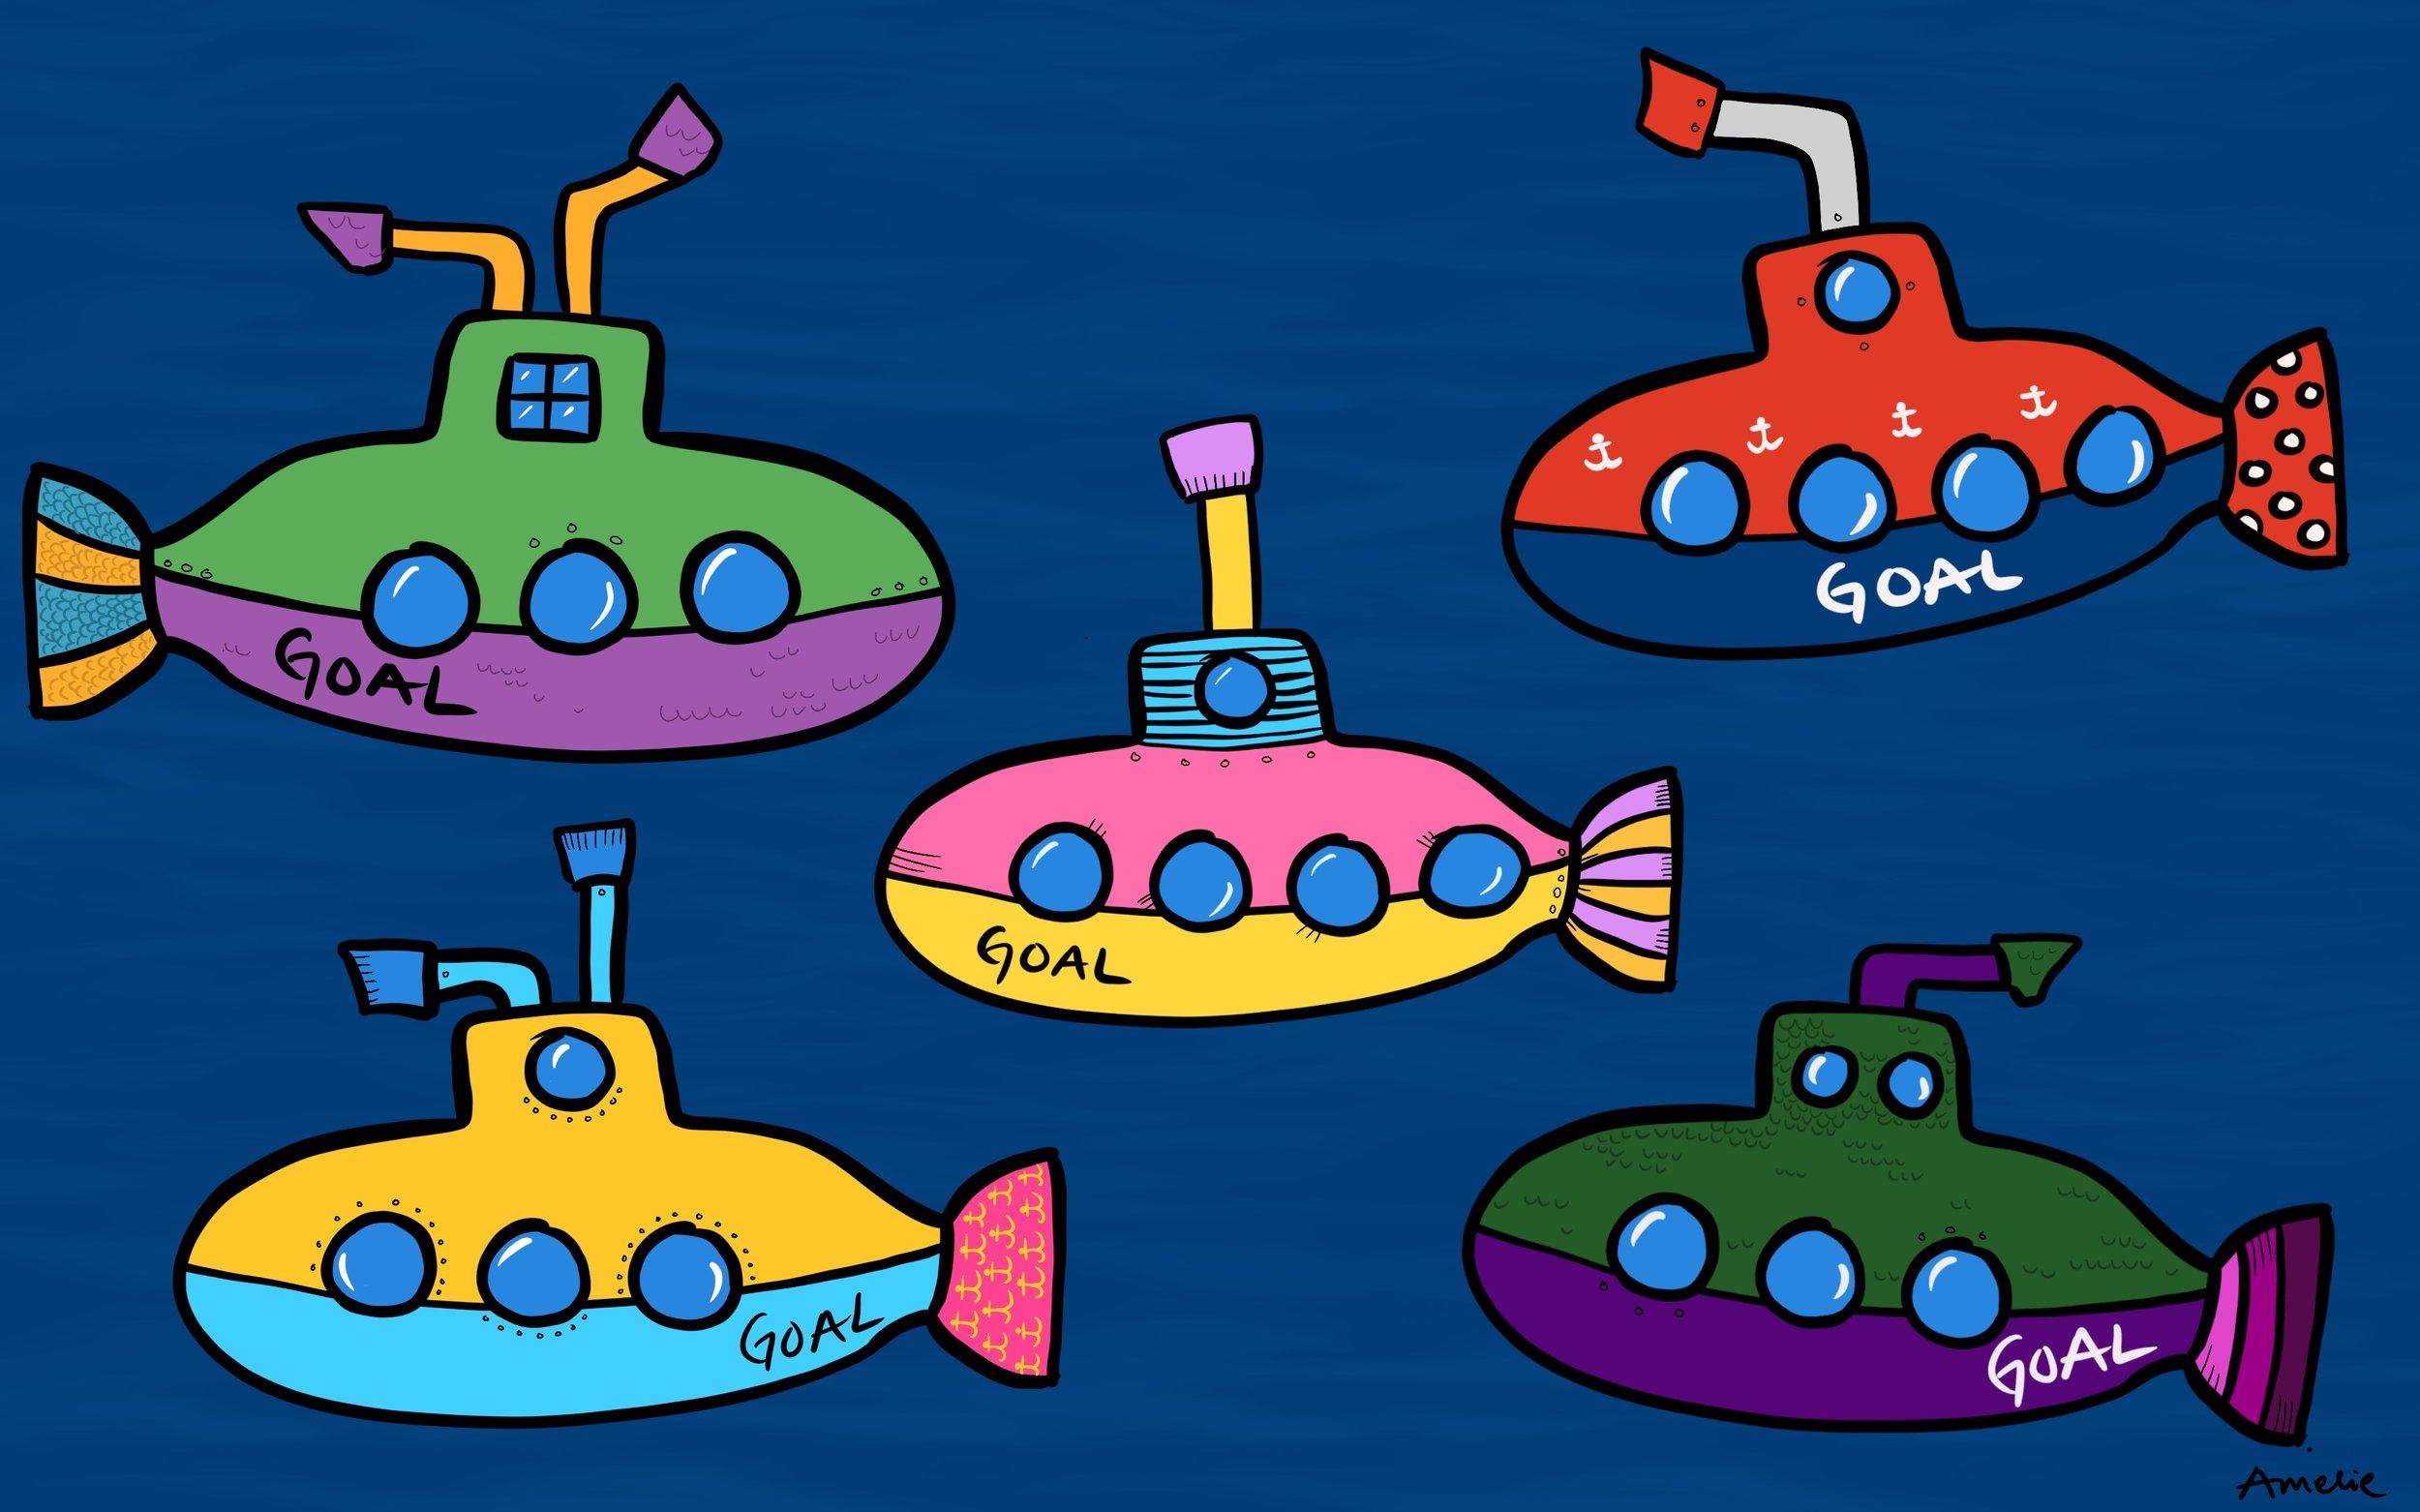 Subgoals, illustration by Amelie Rosengren